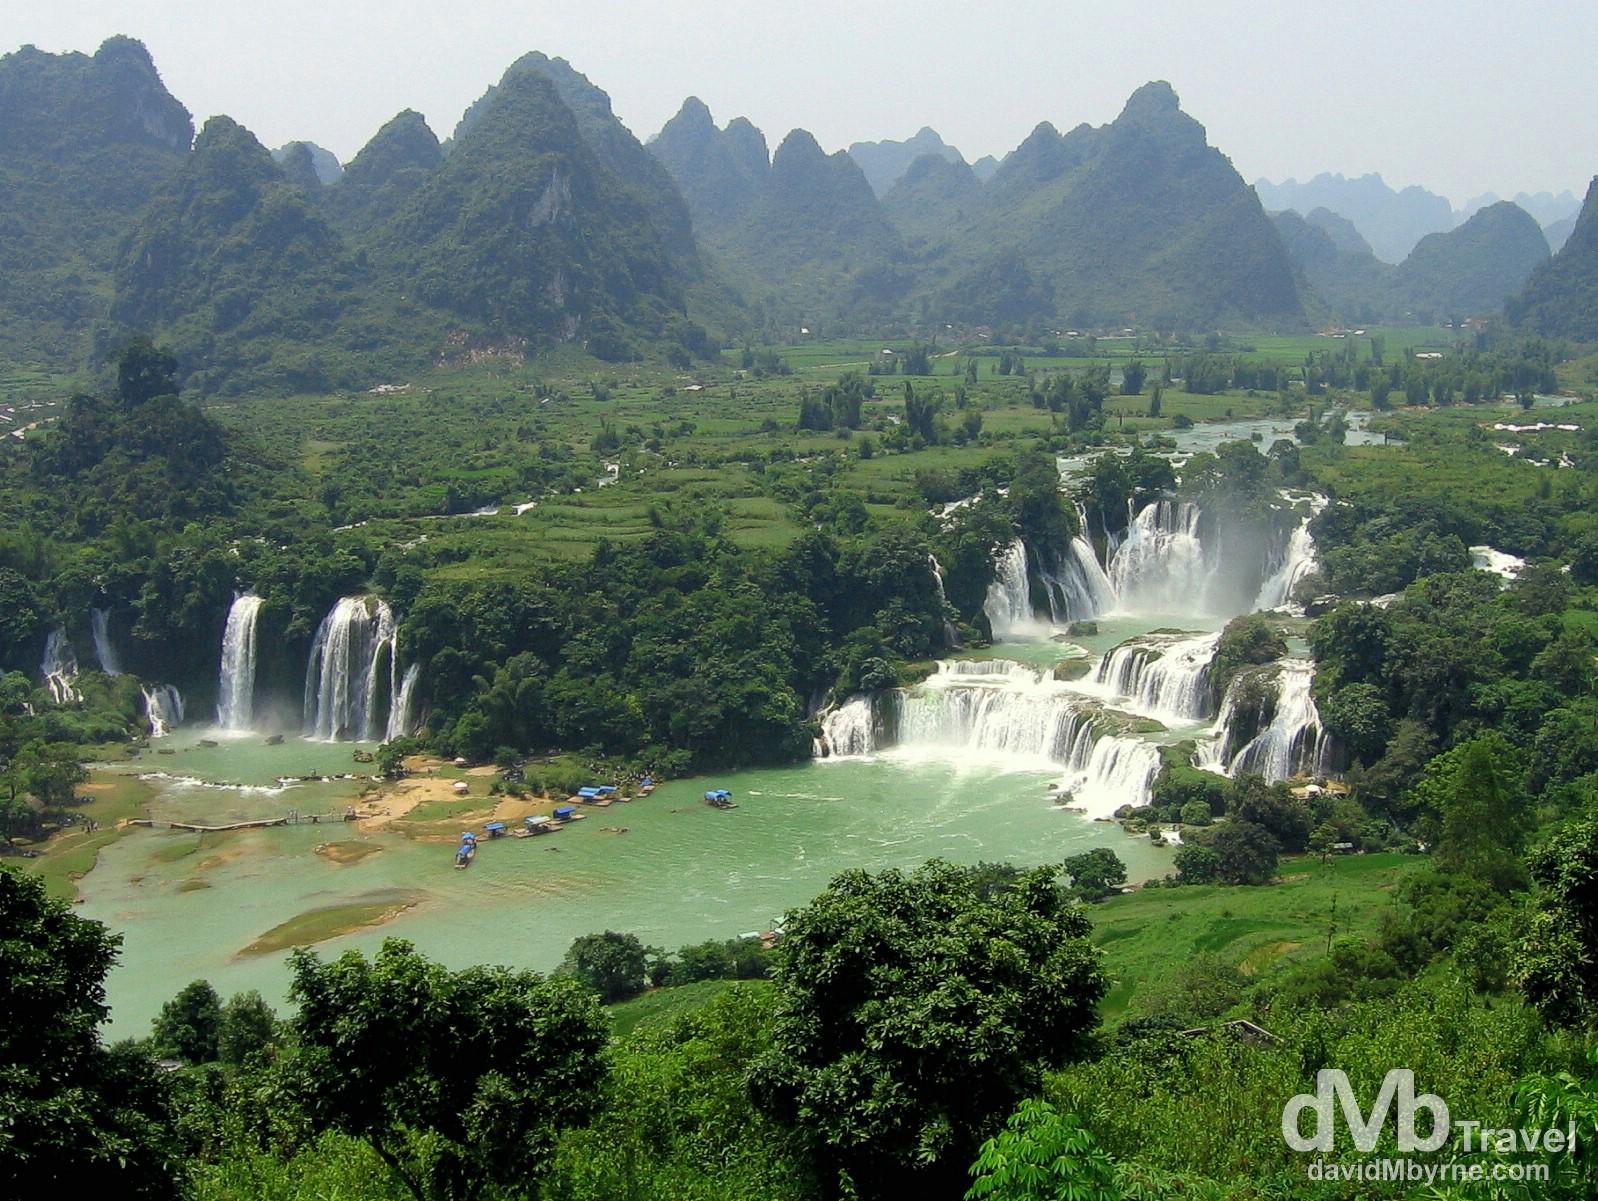 An overview of the impressive Detian Falls (Ban Gioc) straddling the Sino-Vietnamese border. September 2, 2005.